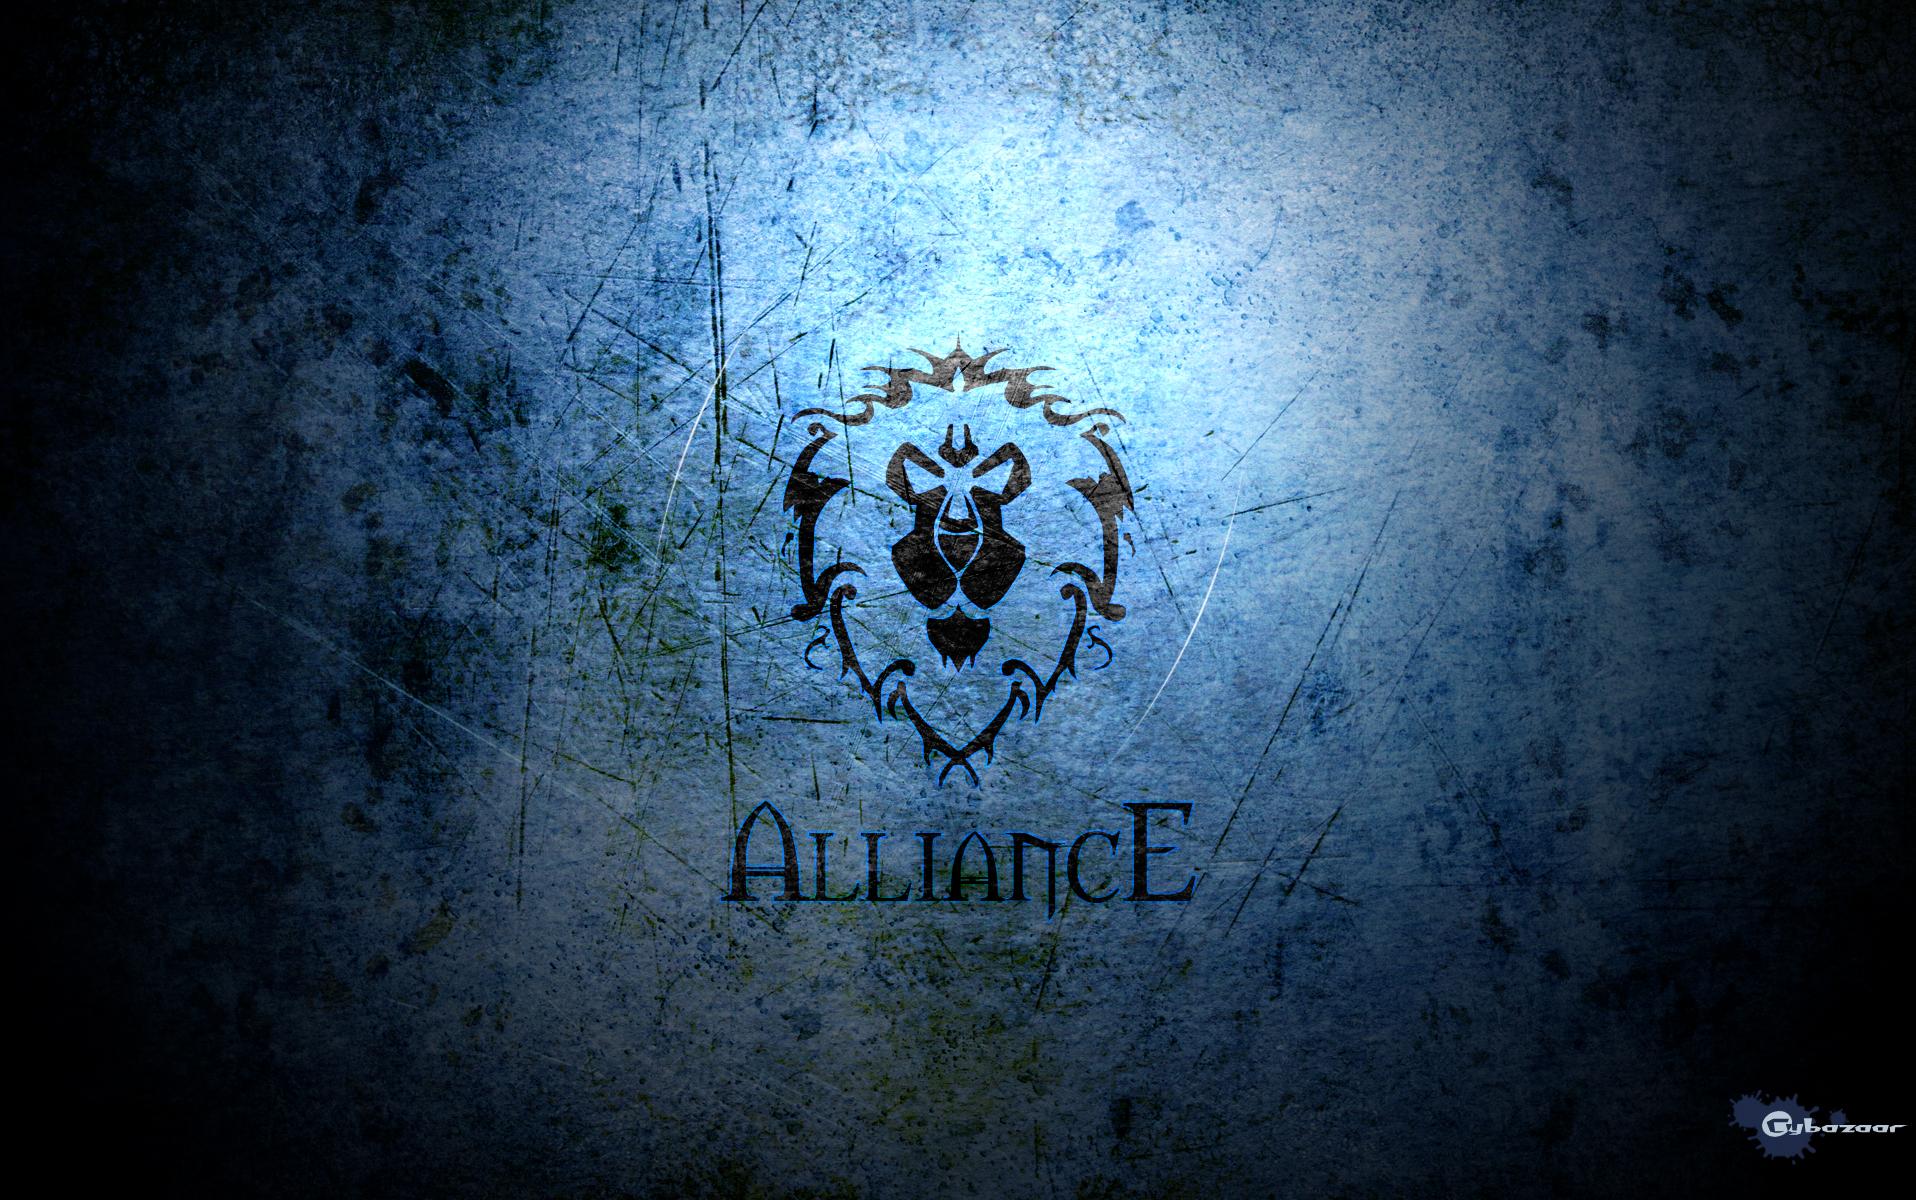 Alliance Wallpaper Pack